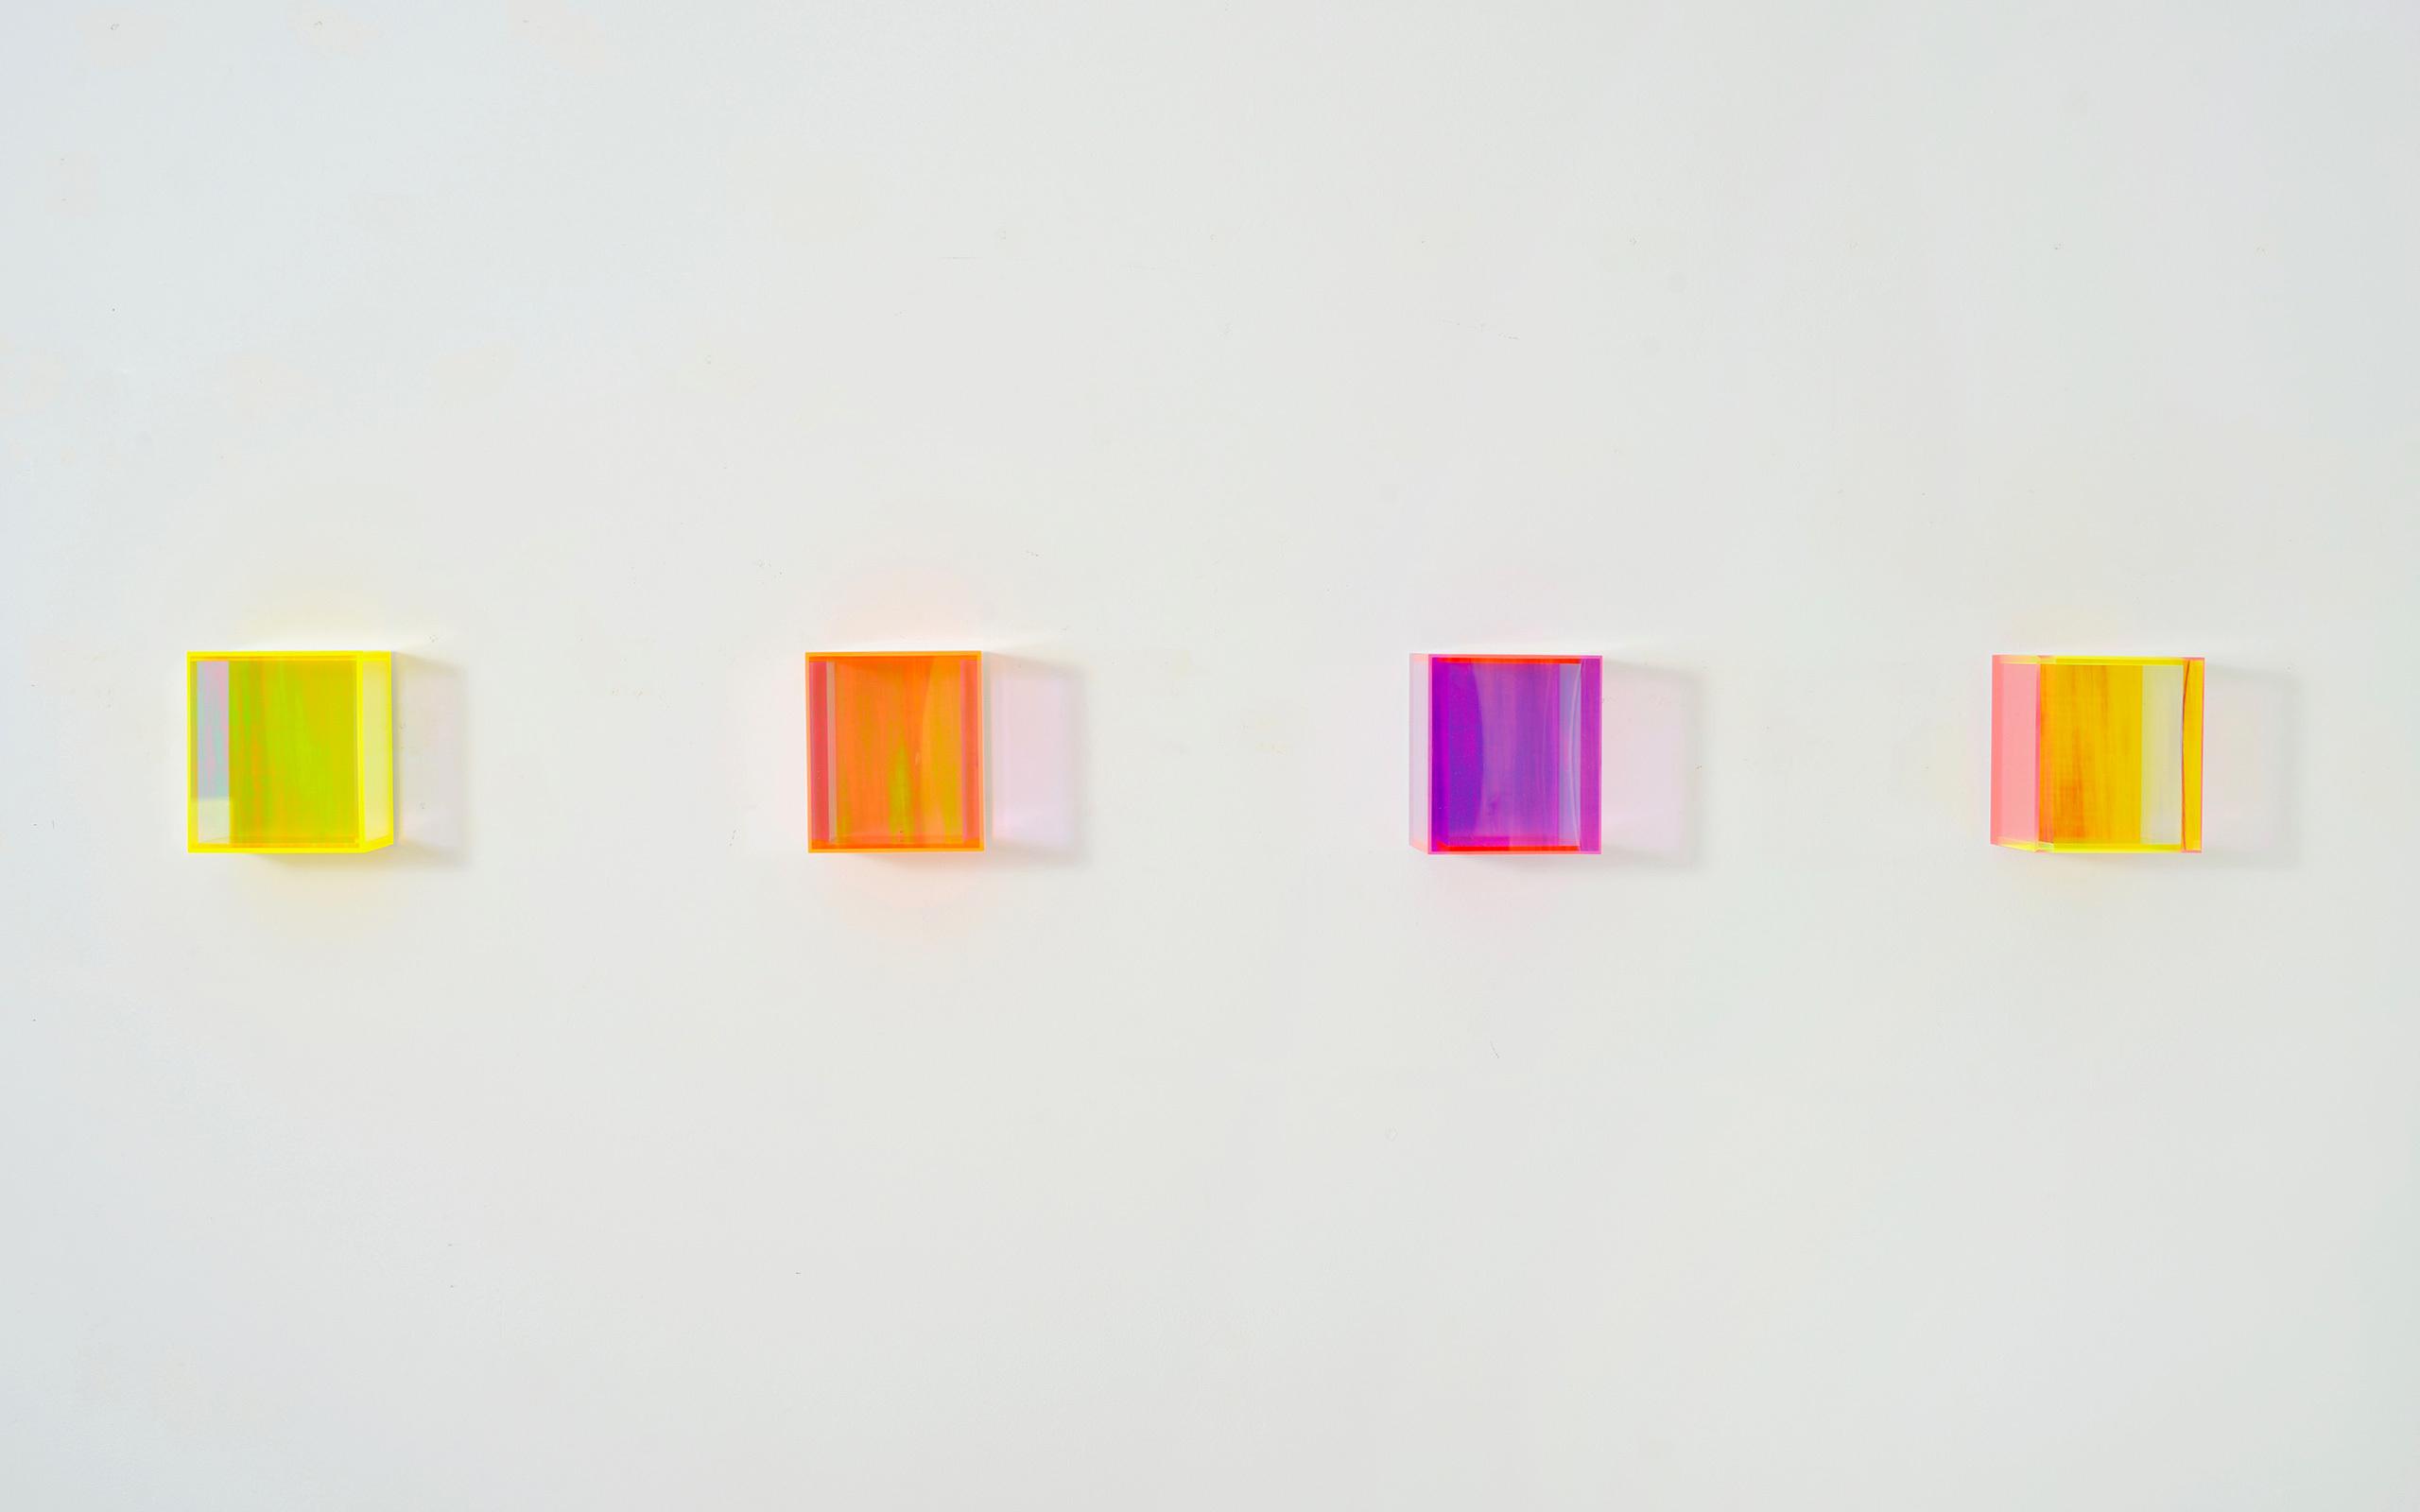 01 Regine Schumann Colormirror Rainbow Full Series 2020